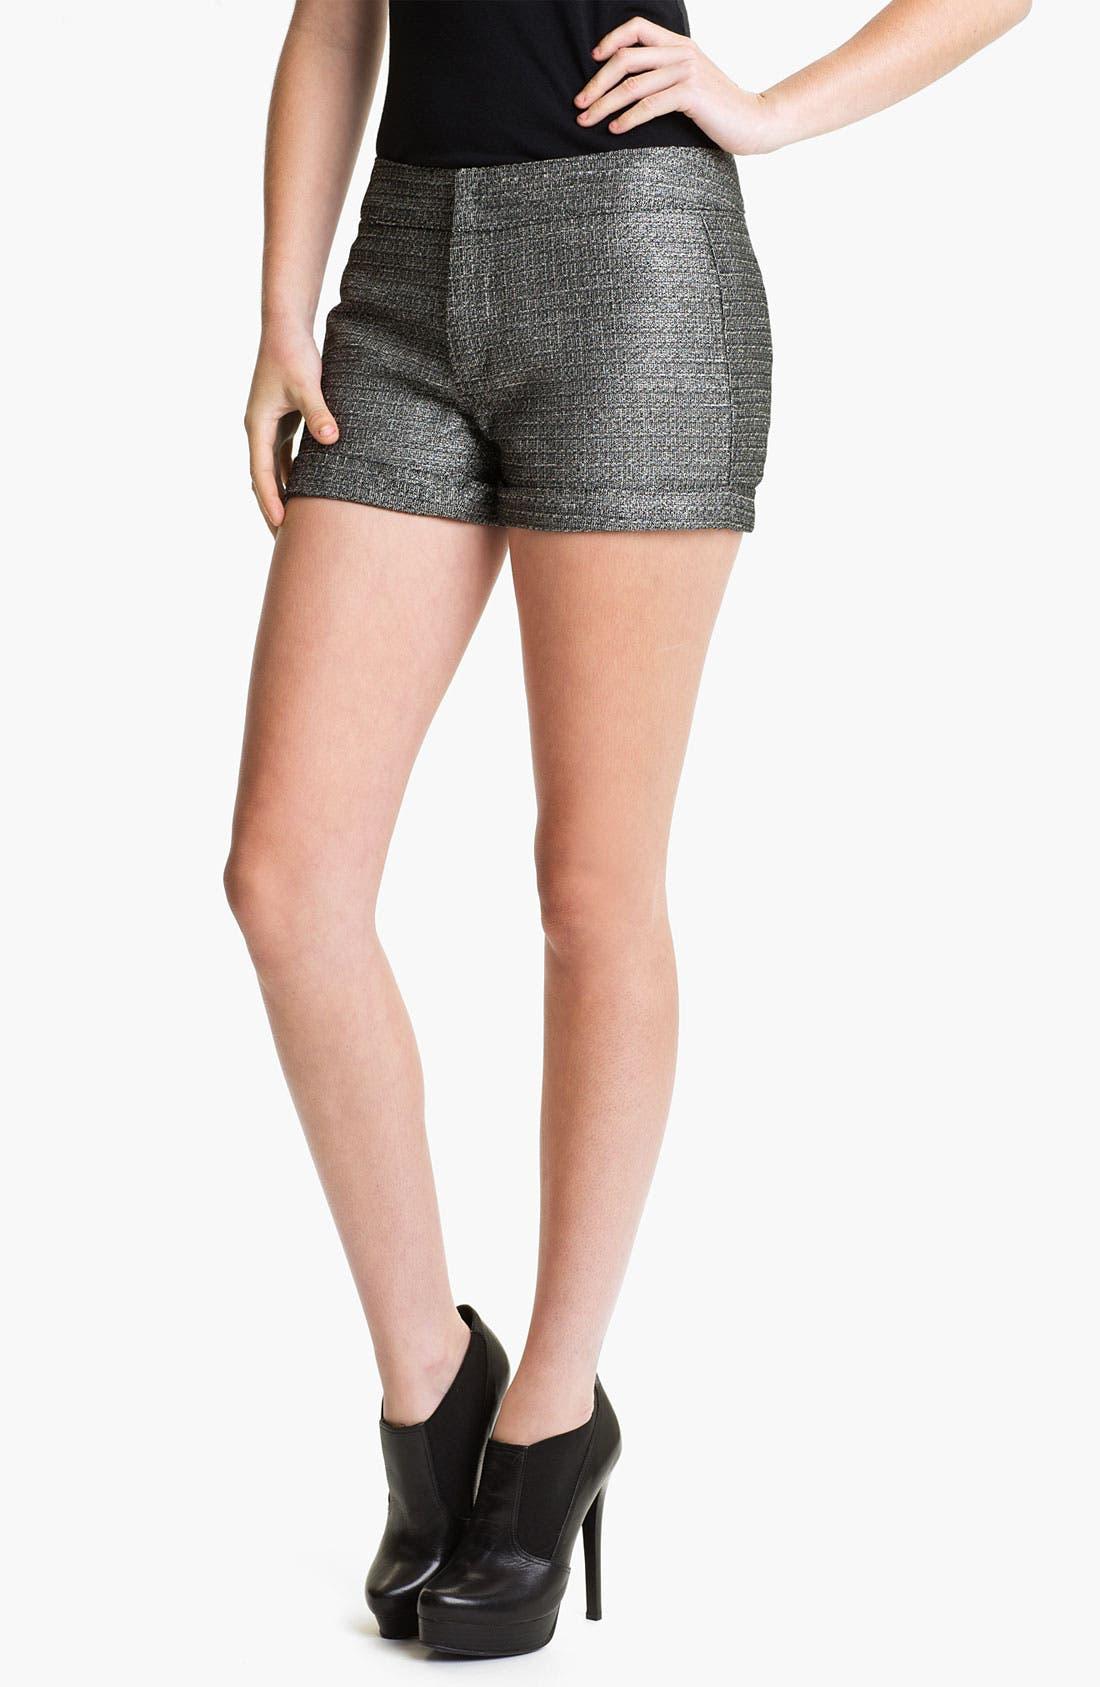 Alternate Image 1 Selected - Ella Moss 'Sylvia' Cuffed Shorts